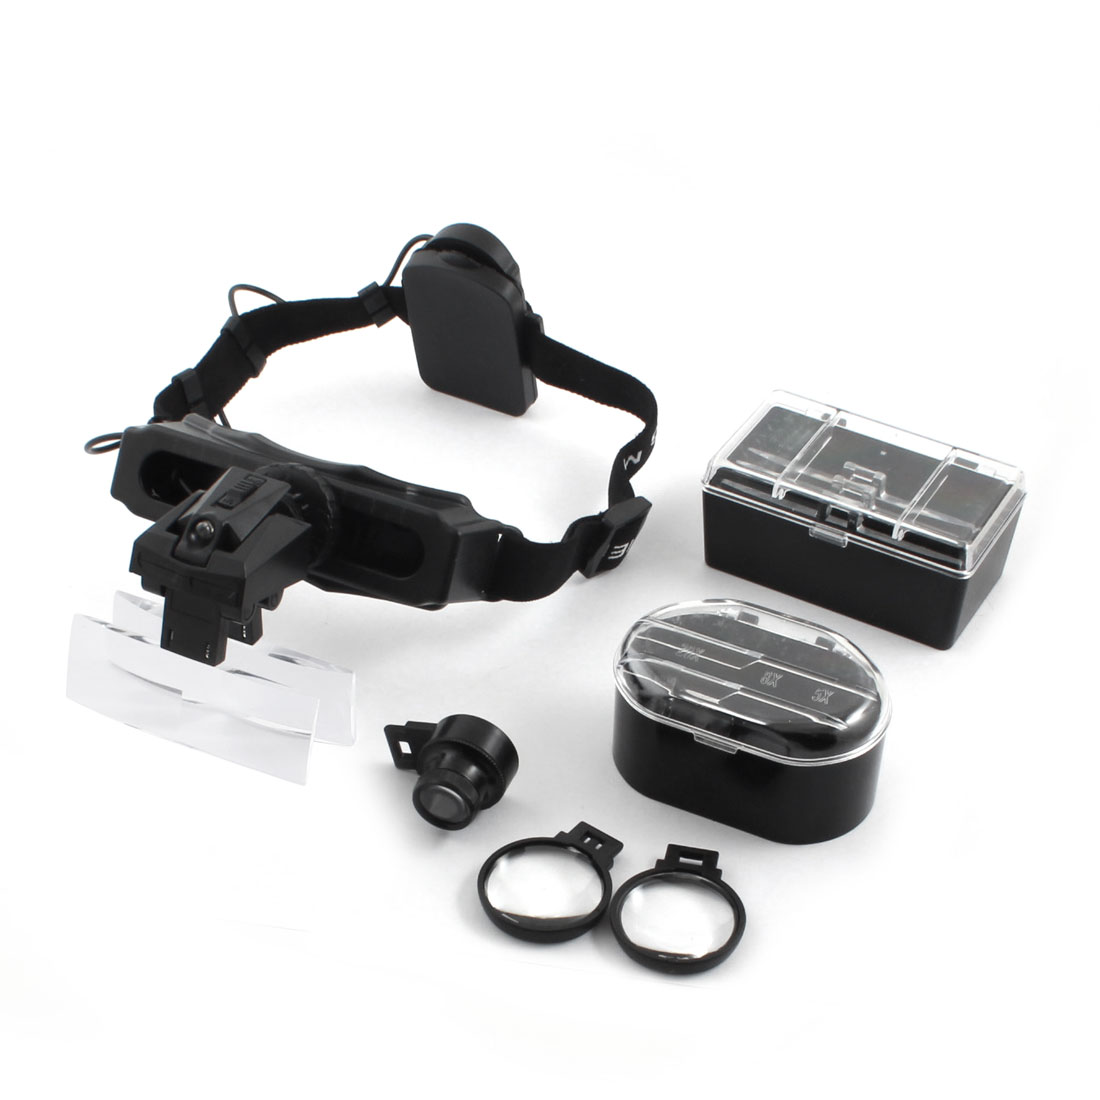 1.0X 1.5X 2.0X 2.5X Lens Loupes 2-LED Head Light Acrylic Adjustable Headband Magnifier